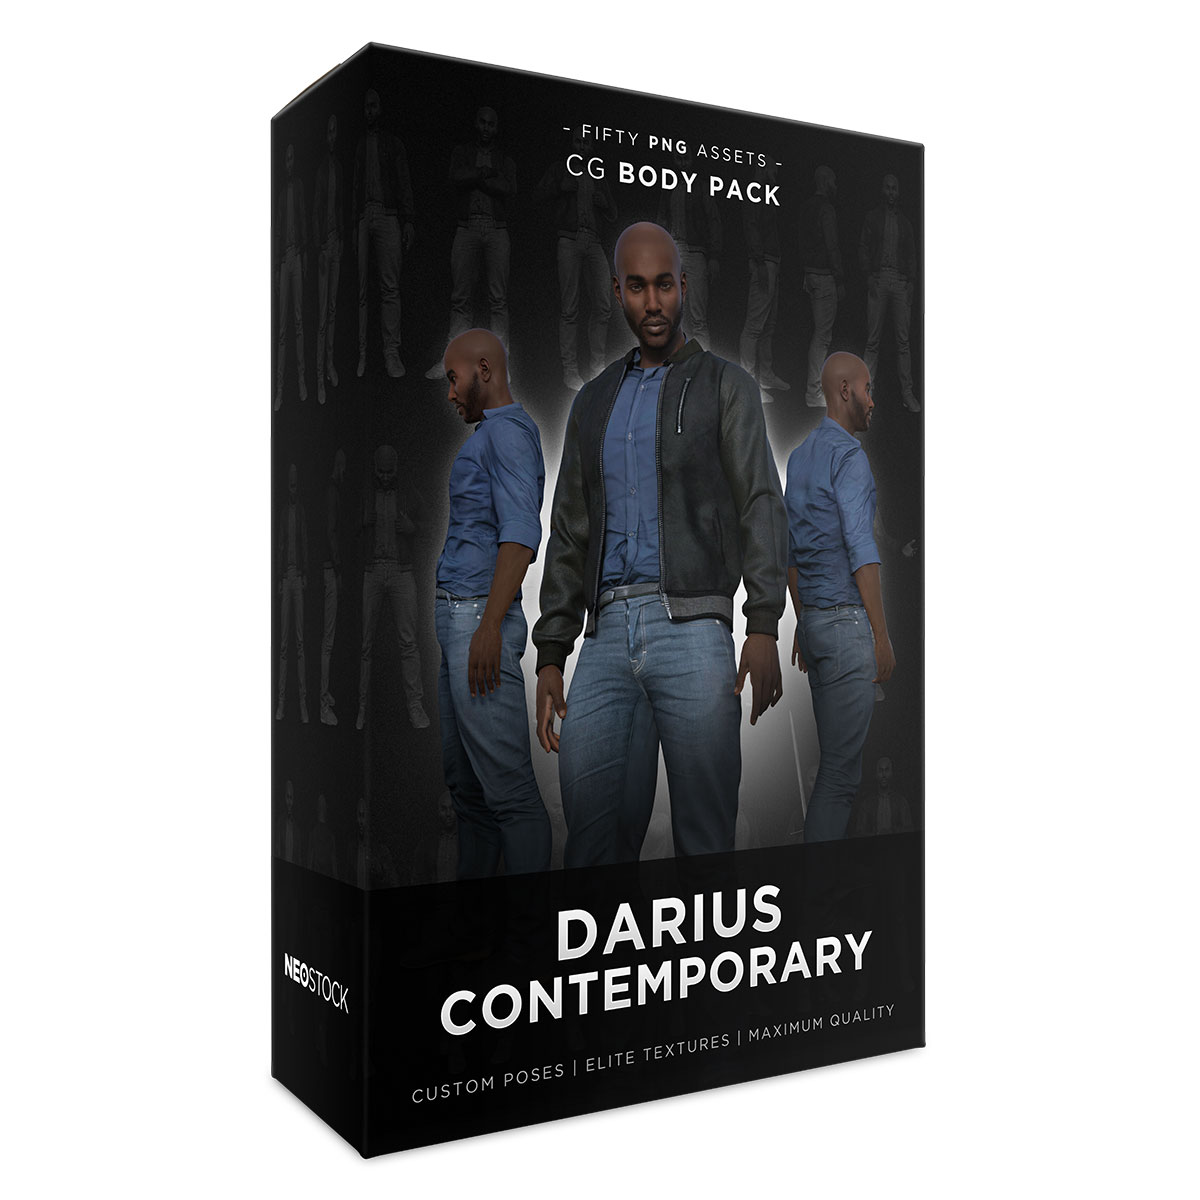 darius contemporary product box sales